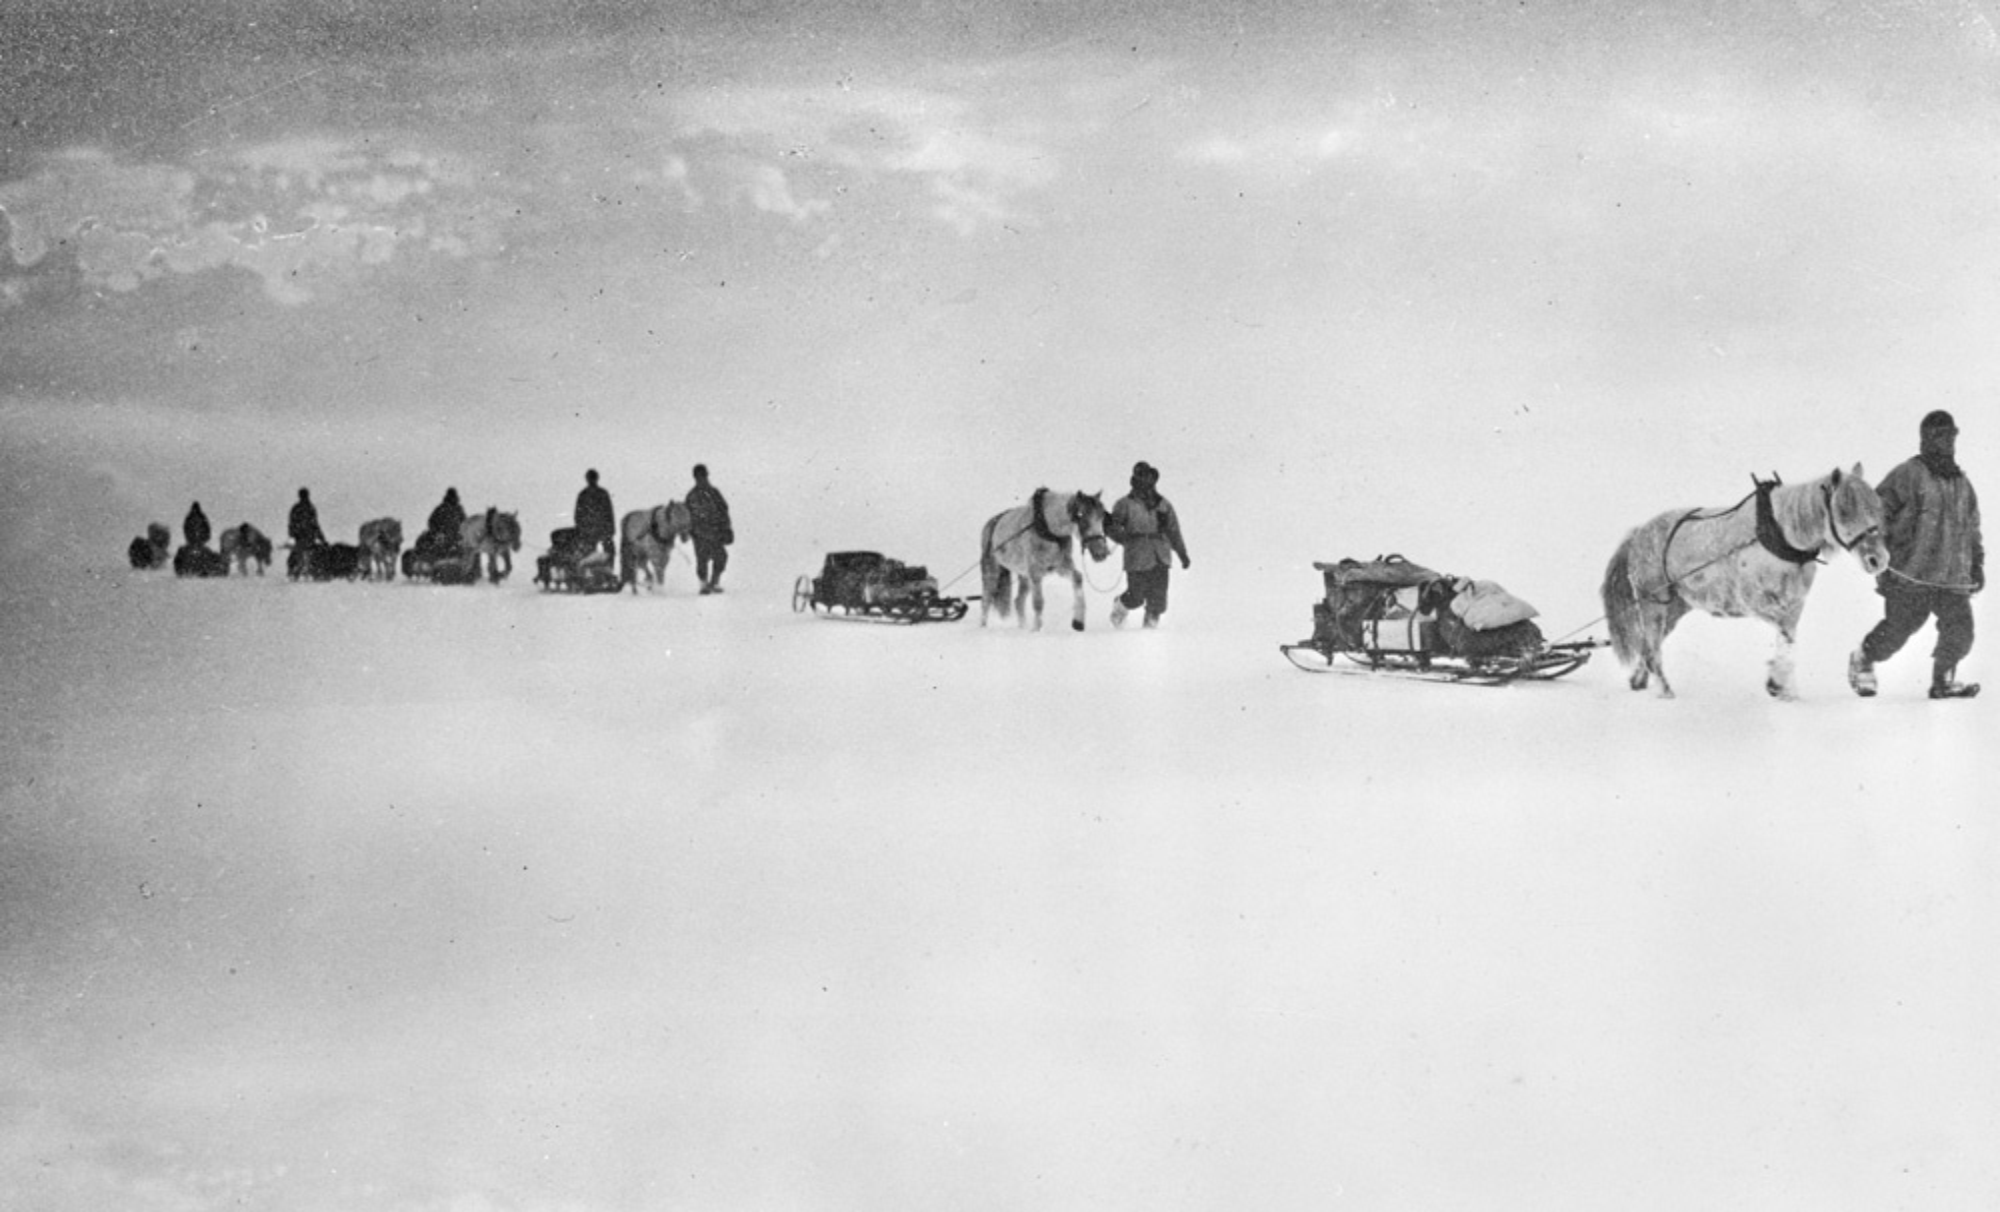 Robert Falcon Scott, South Pole, the Terra Nova expedition, 1910-1913